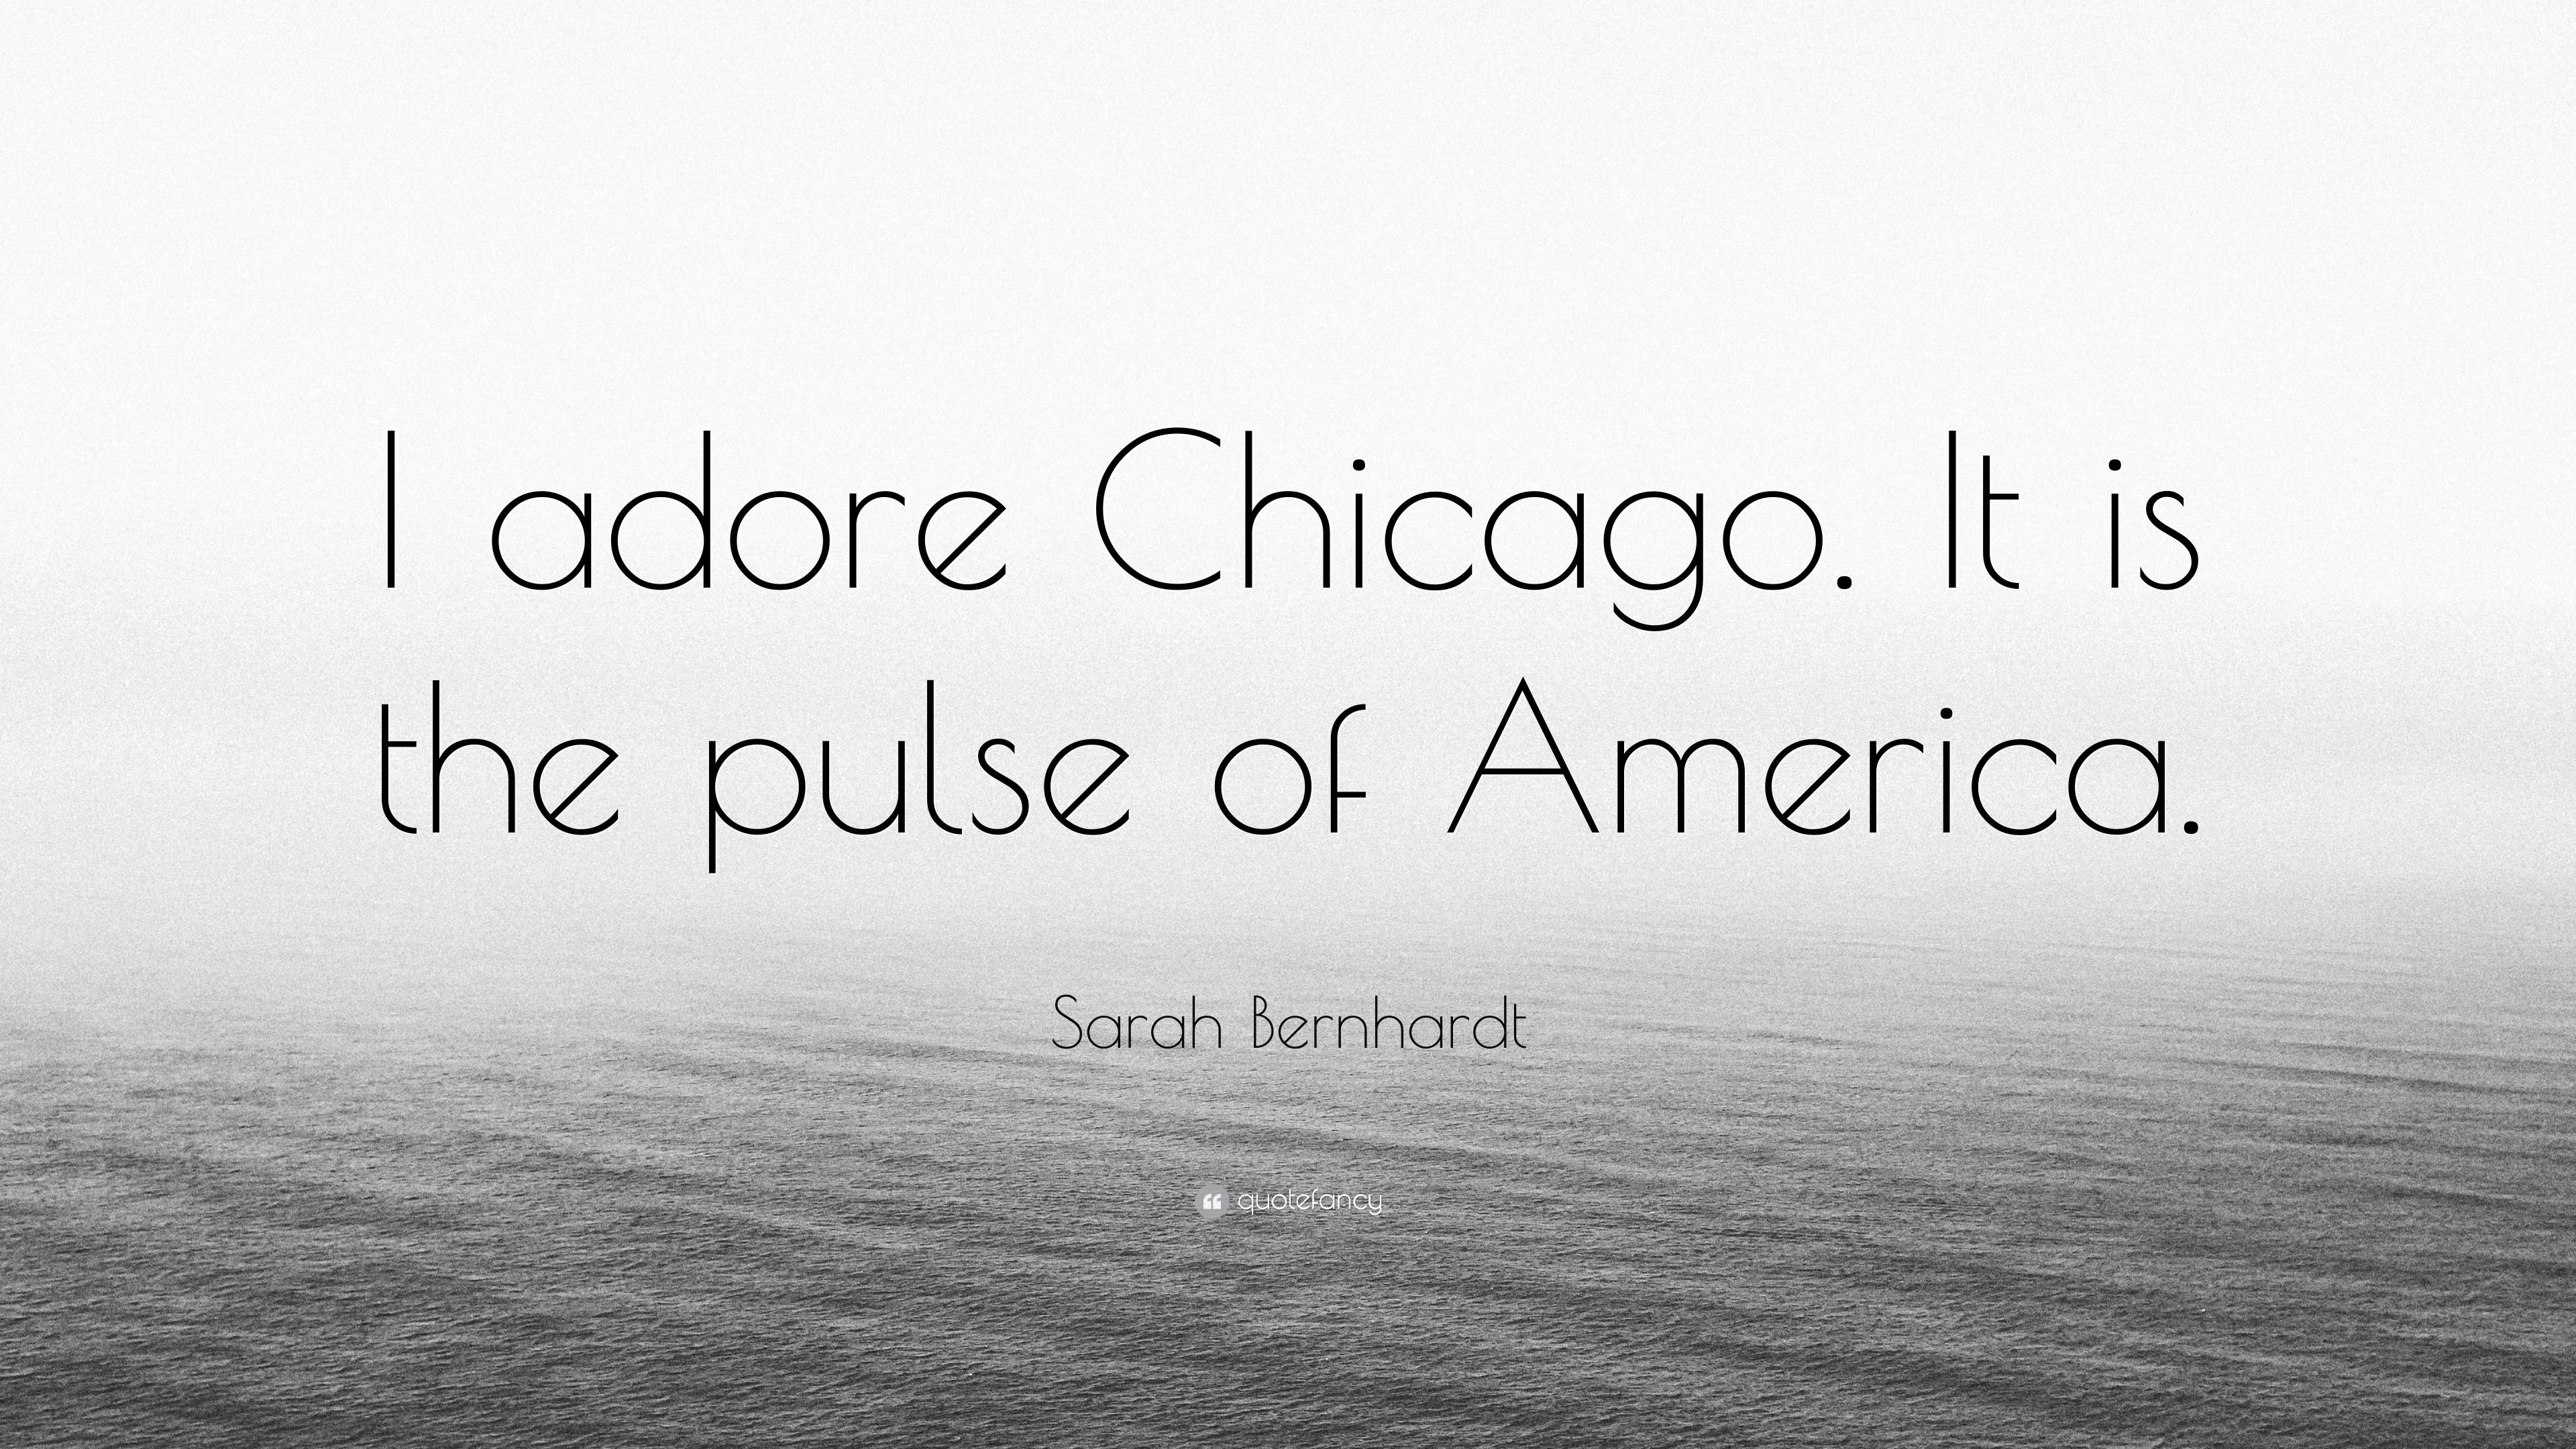 bernhardt logo. Sarah Bernhardt Quote: \u201cI Adore Chicago. It Is The Pulse Of America. Logo